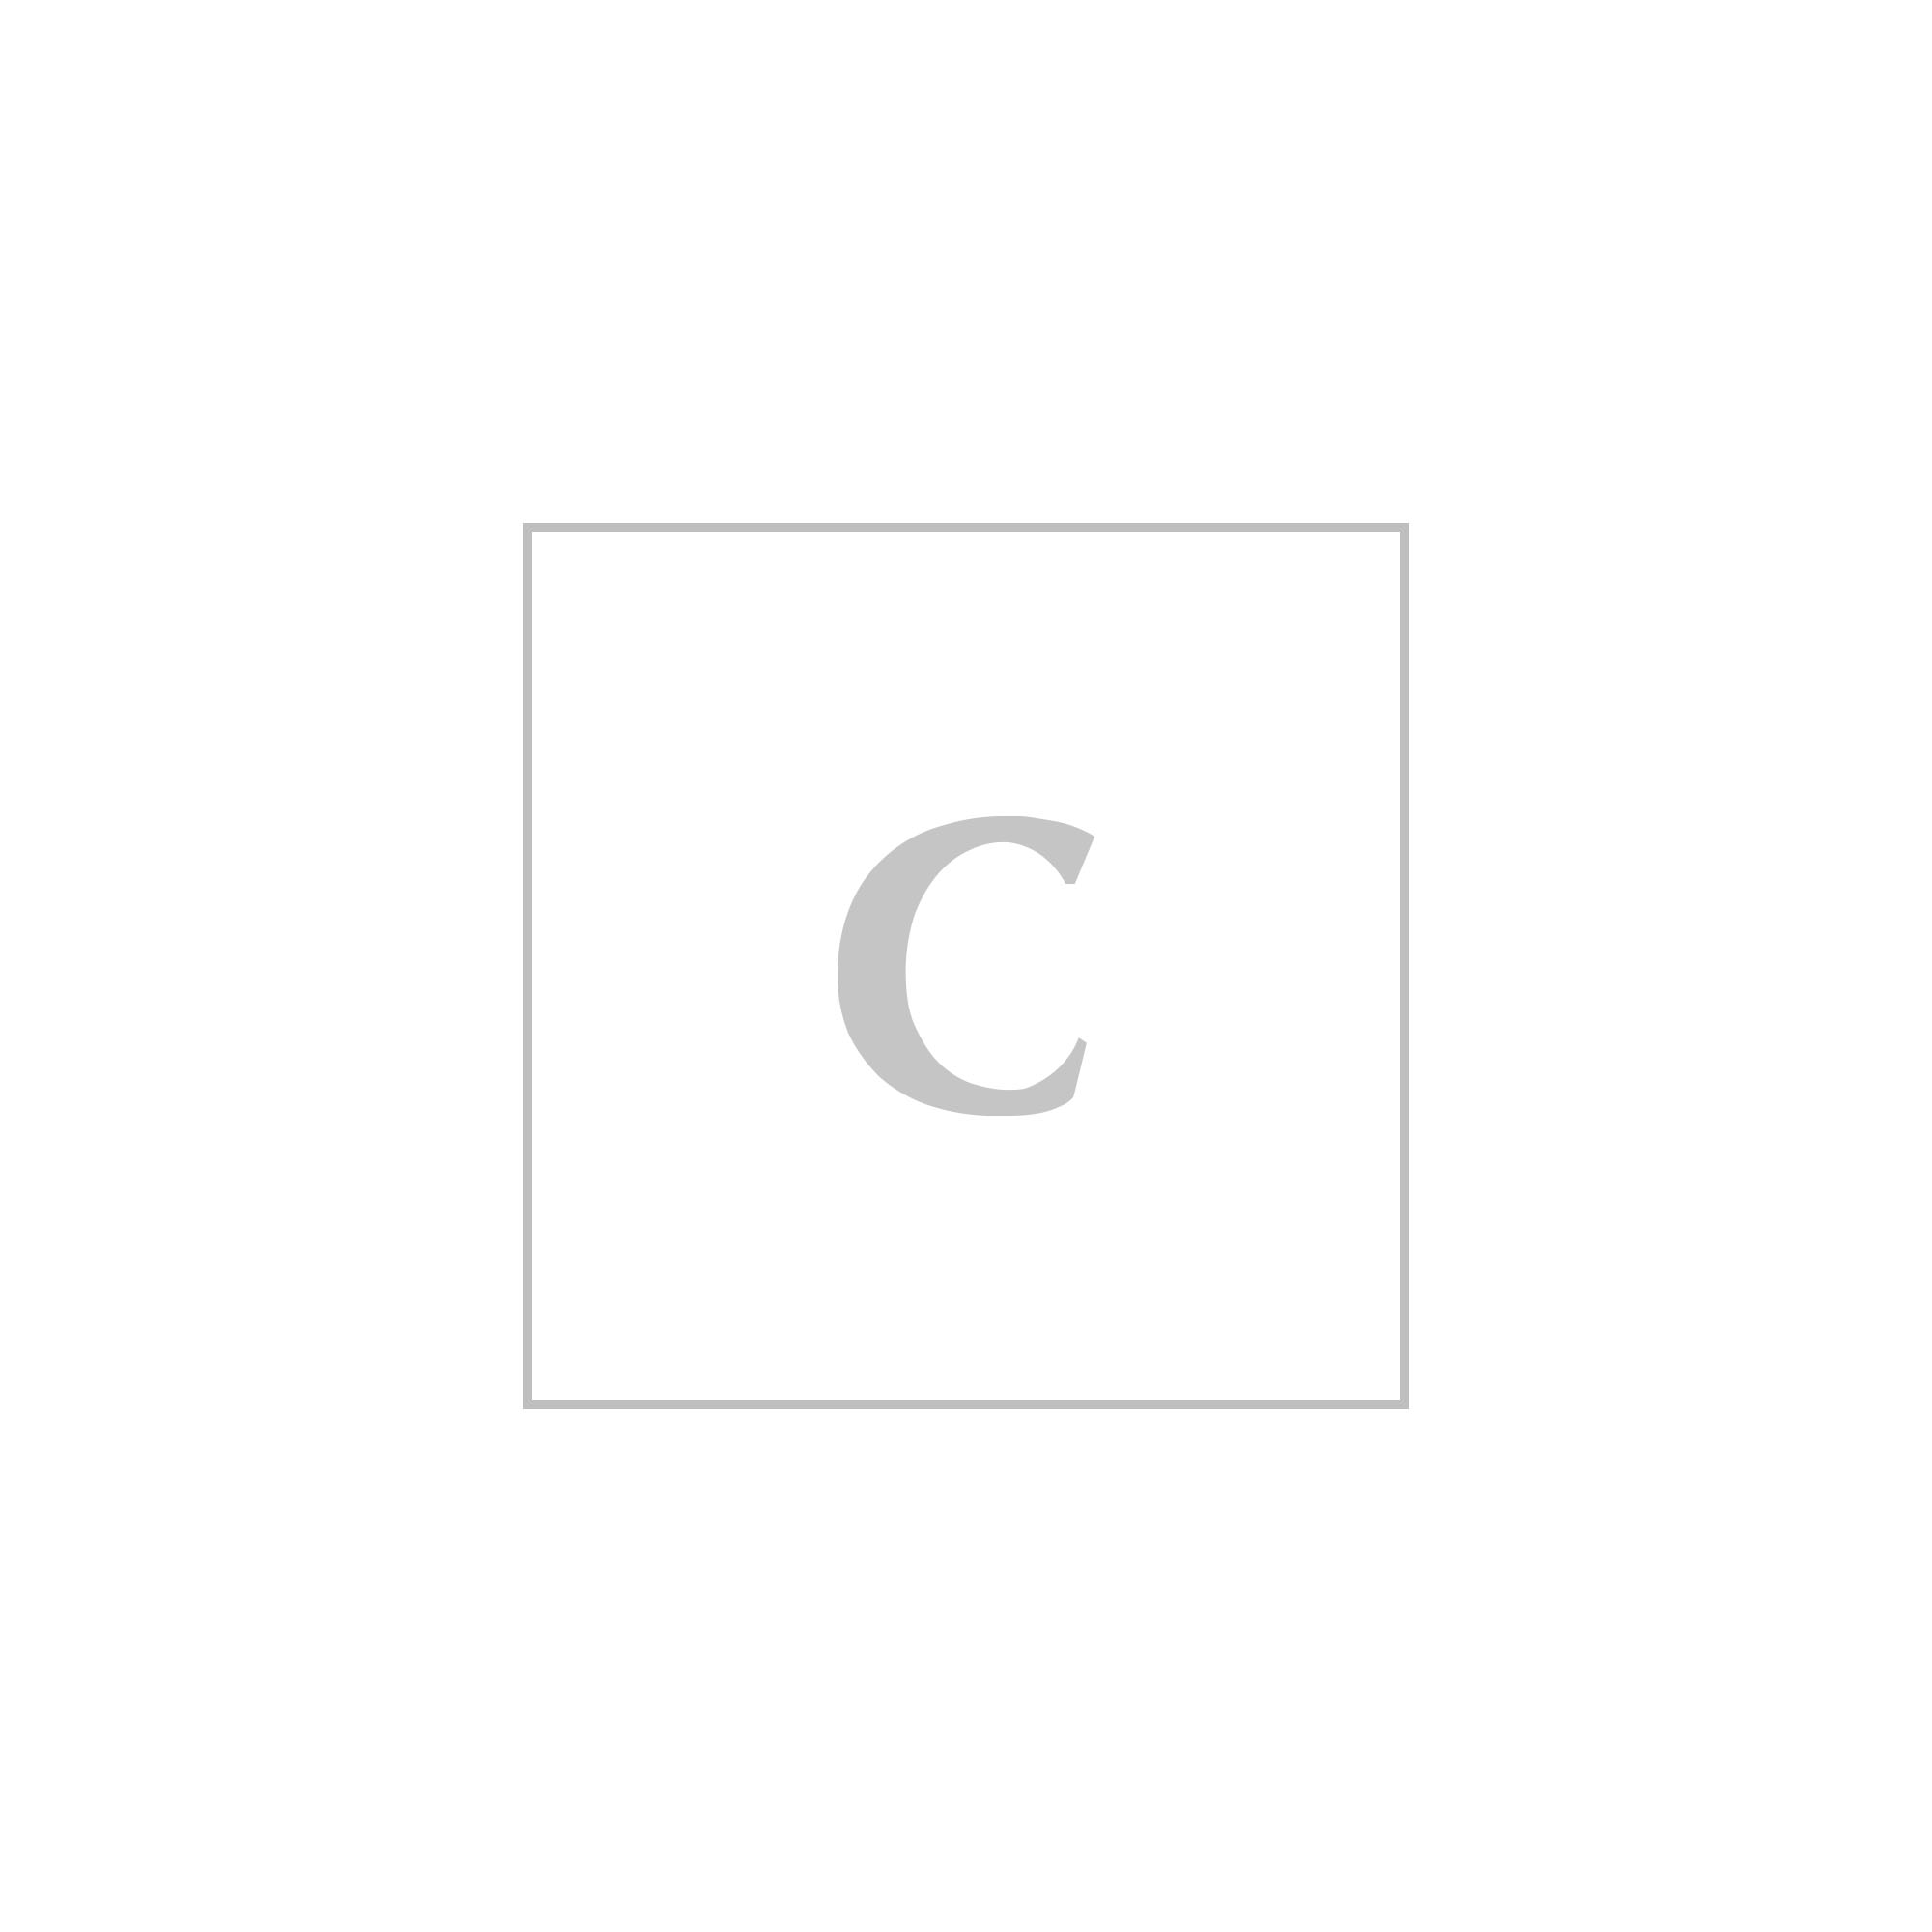 Lanvin laced stiletto pump in calfskin